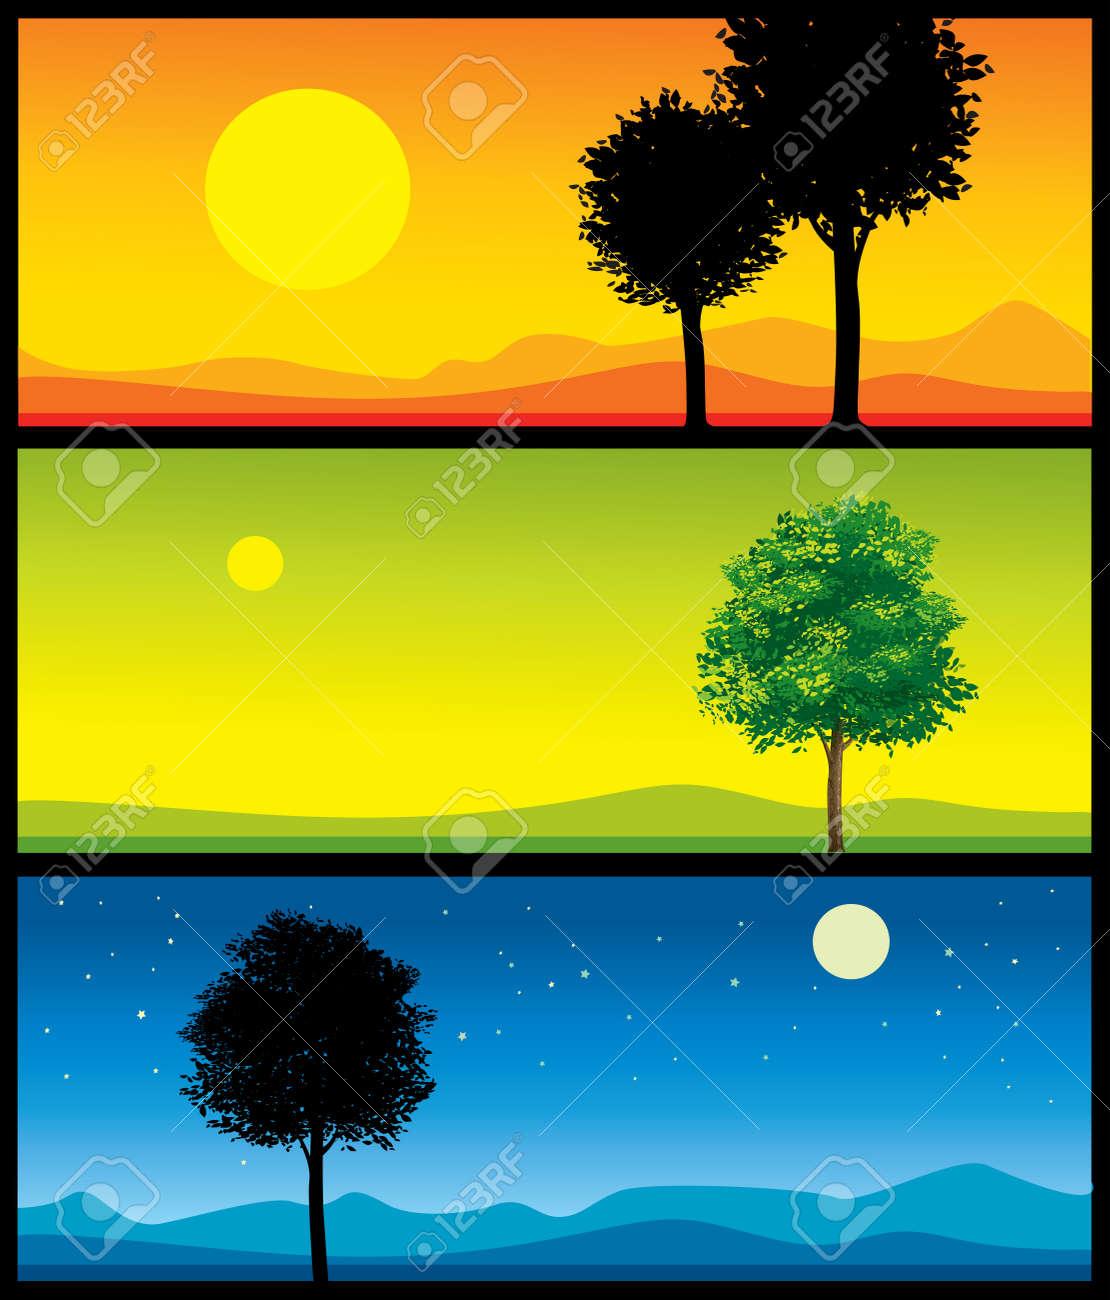 landscape illustrations Stock Vector - 9715612